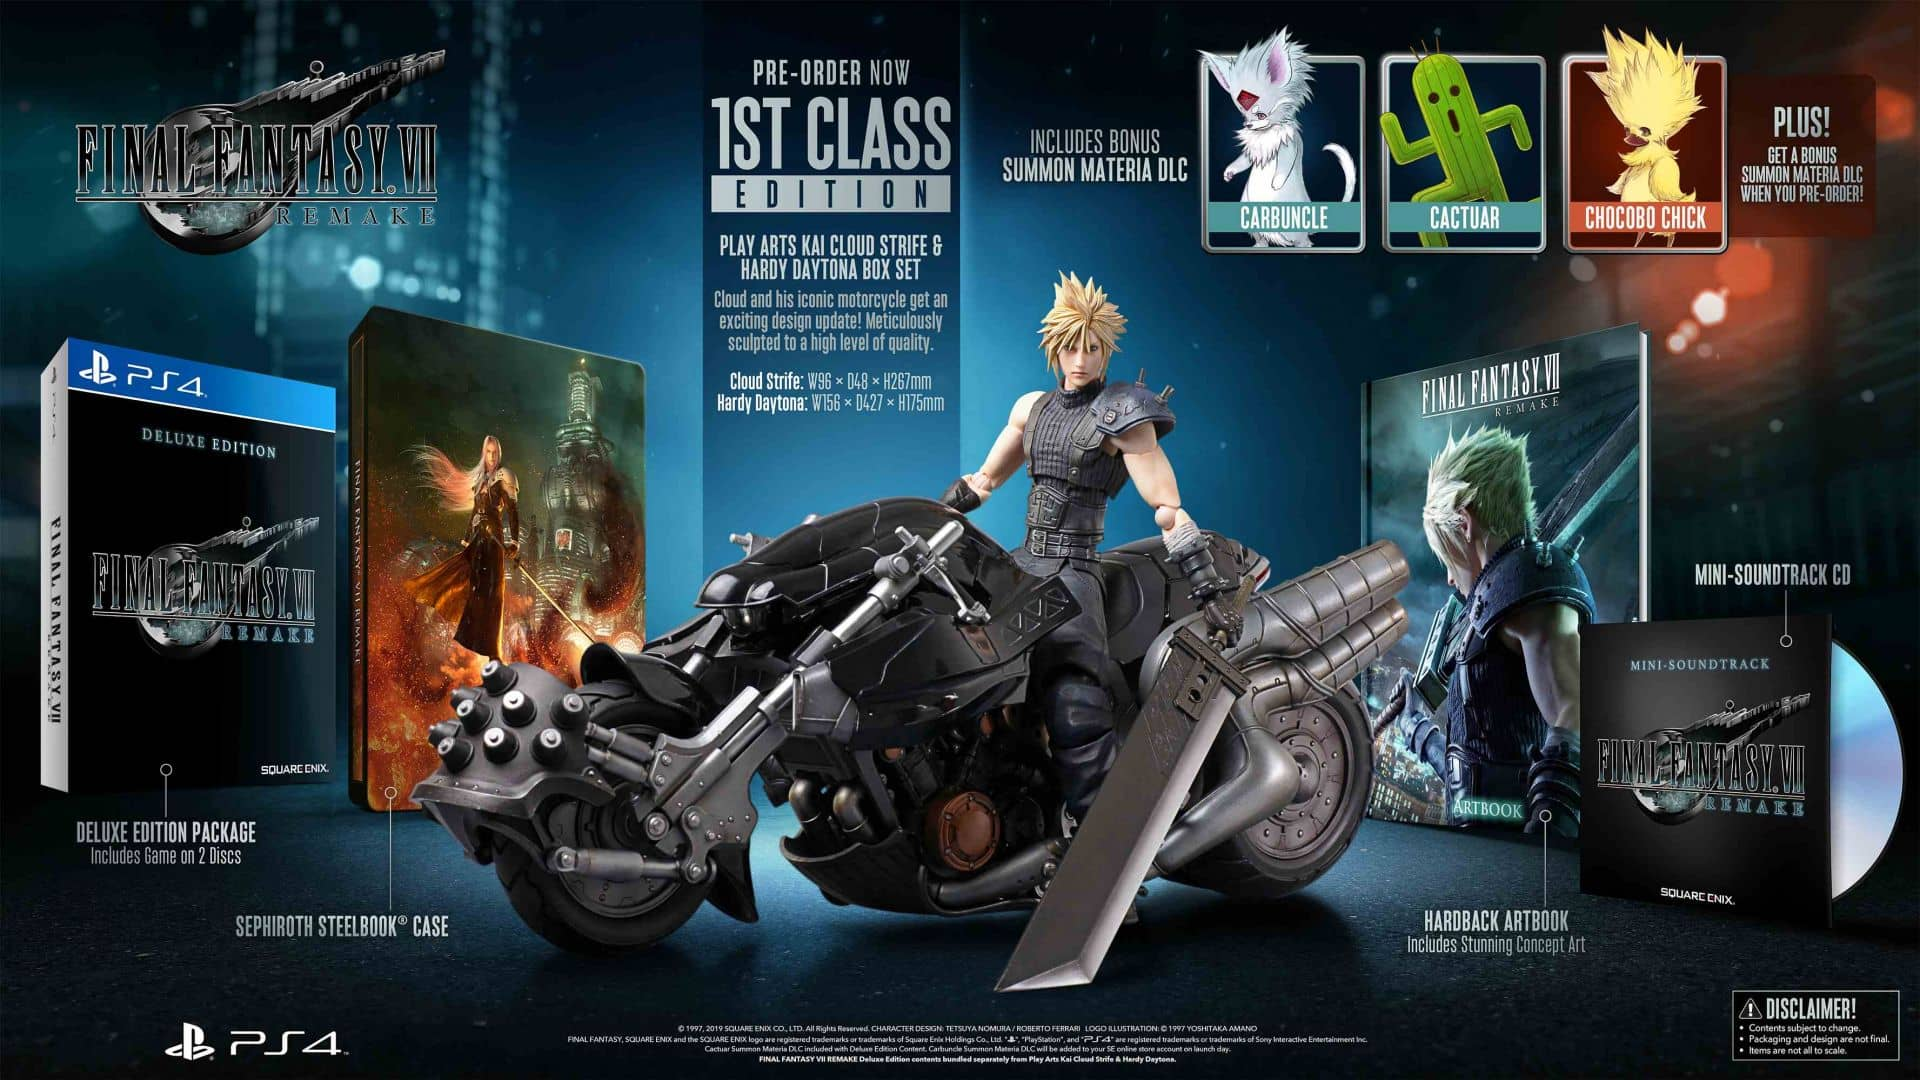 E3 Final Fantasy VII Remake, 1st Class Edition